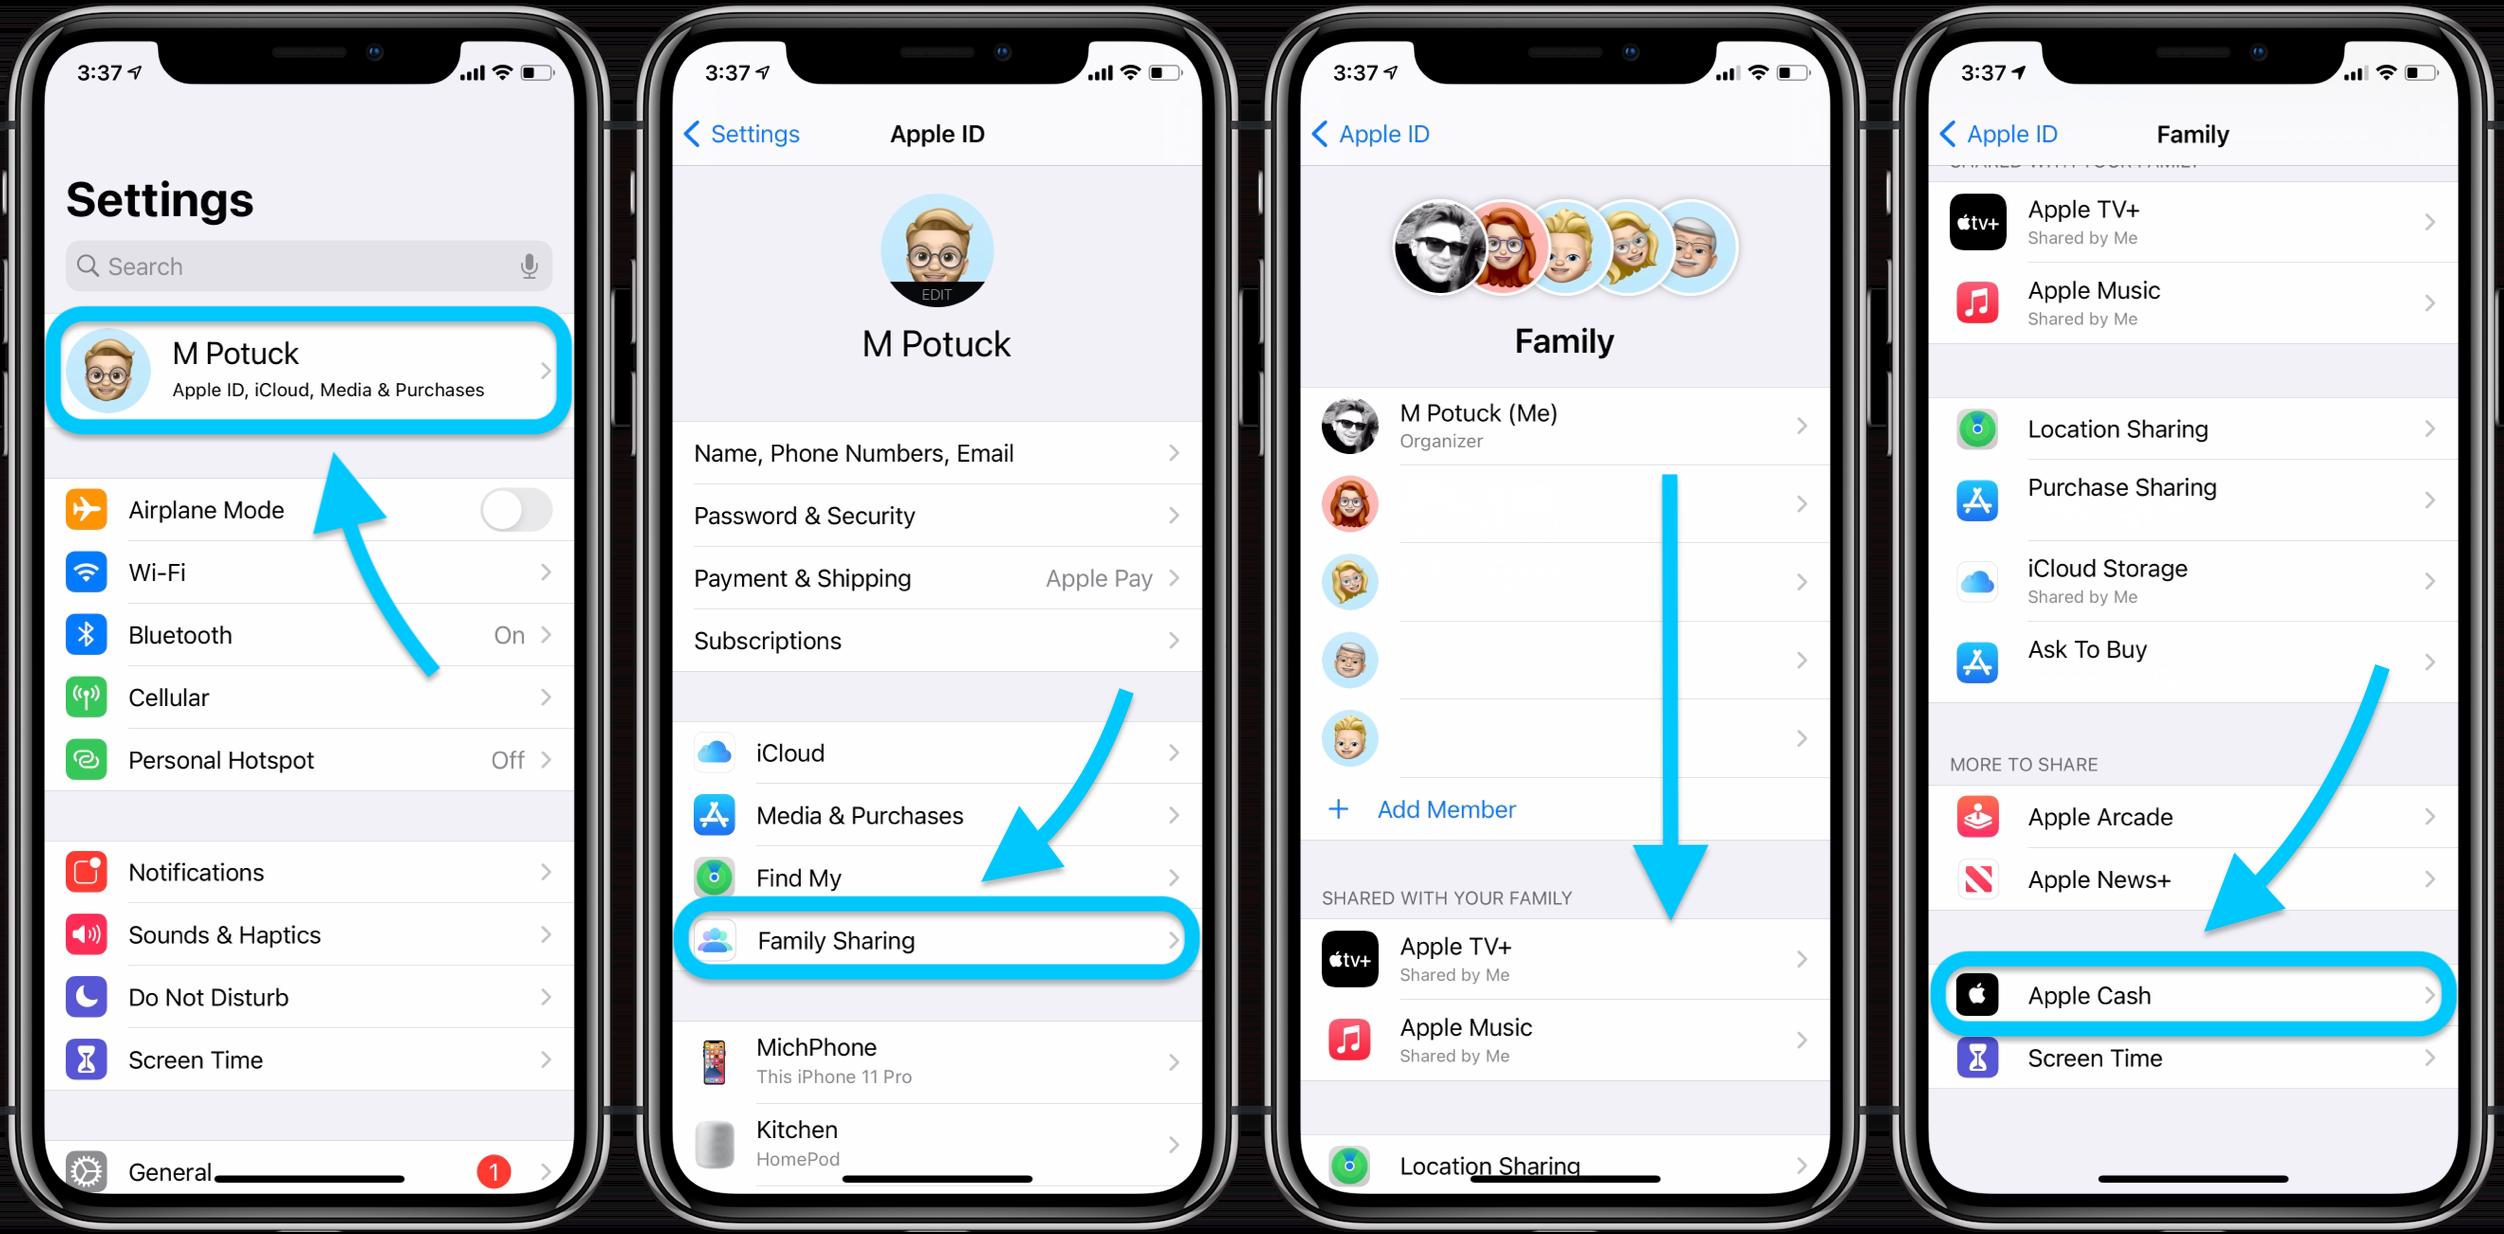 How to setup up Apple Cash Family walkthrough 1